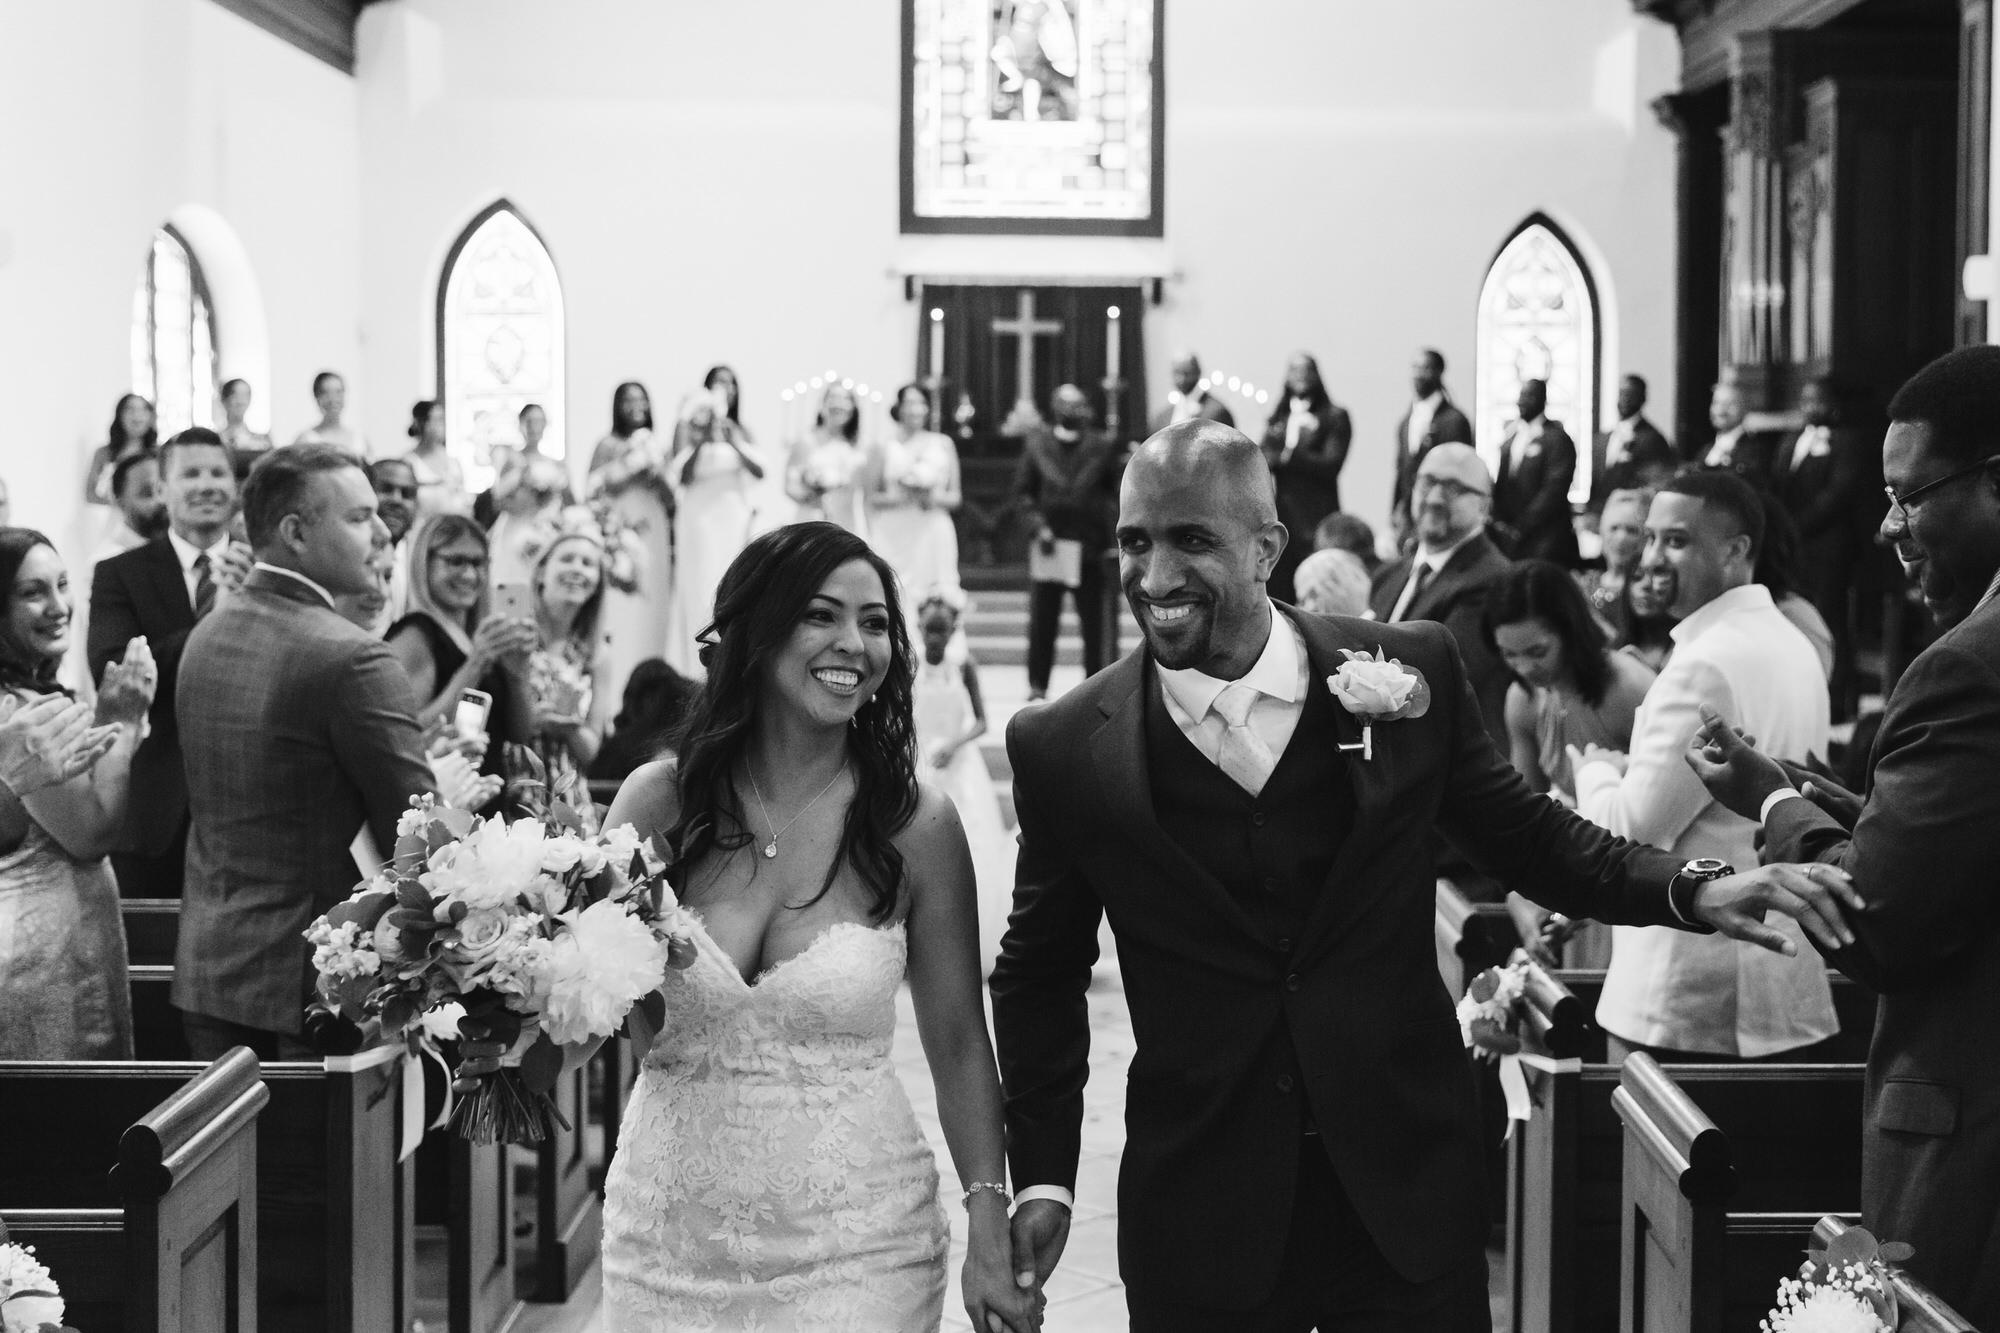 st-lukes-chapel-cannon-green-charleston-wedding-937.JPG